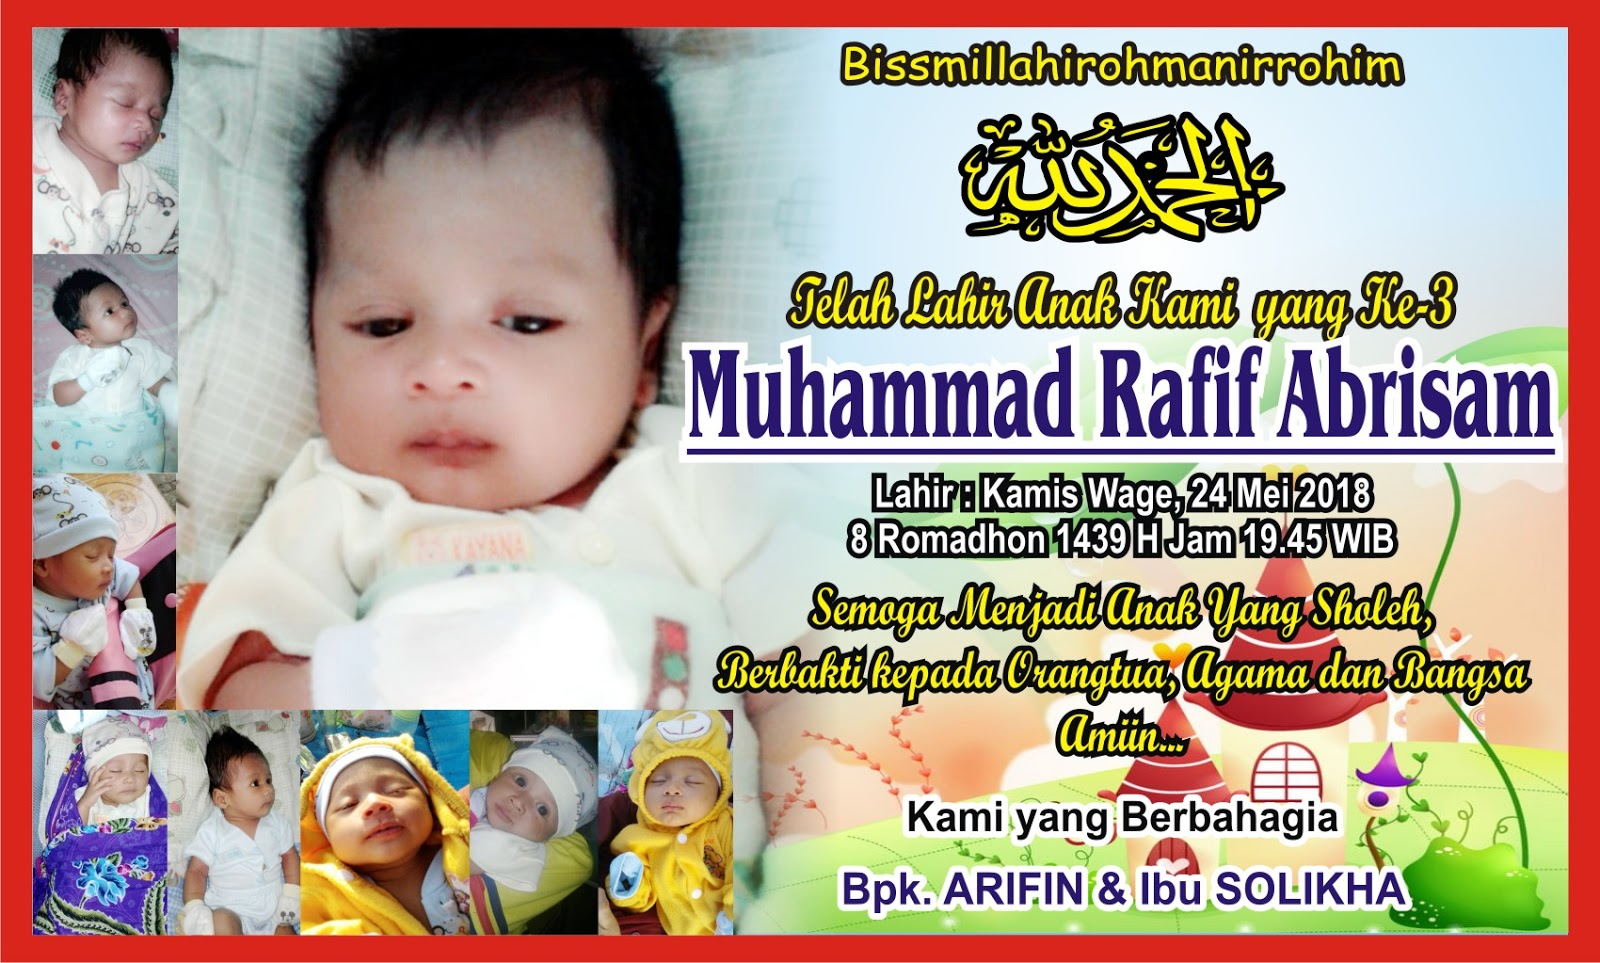 Contoh Banner Nama Bayi Walimatut Tasmiyah